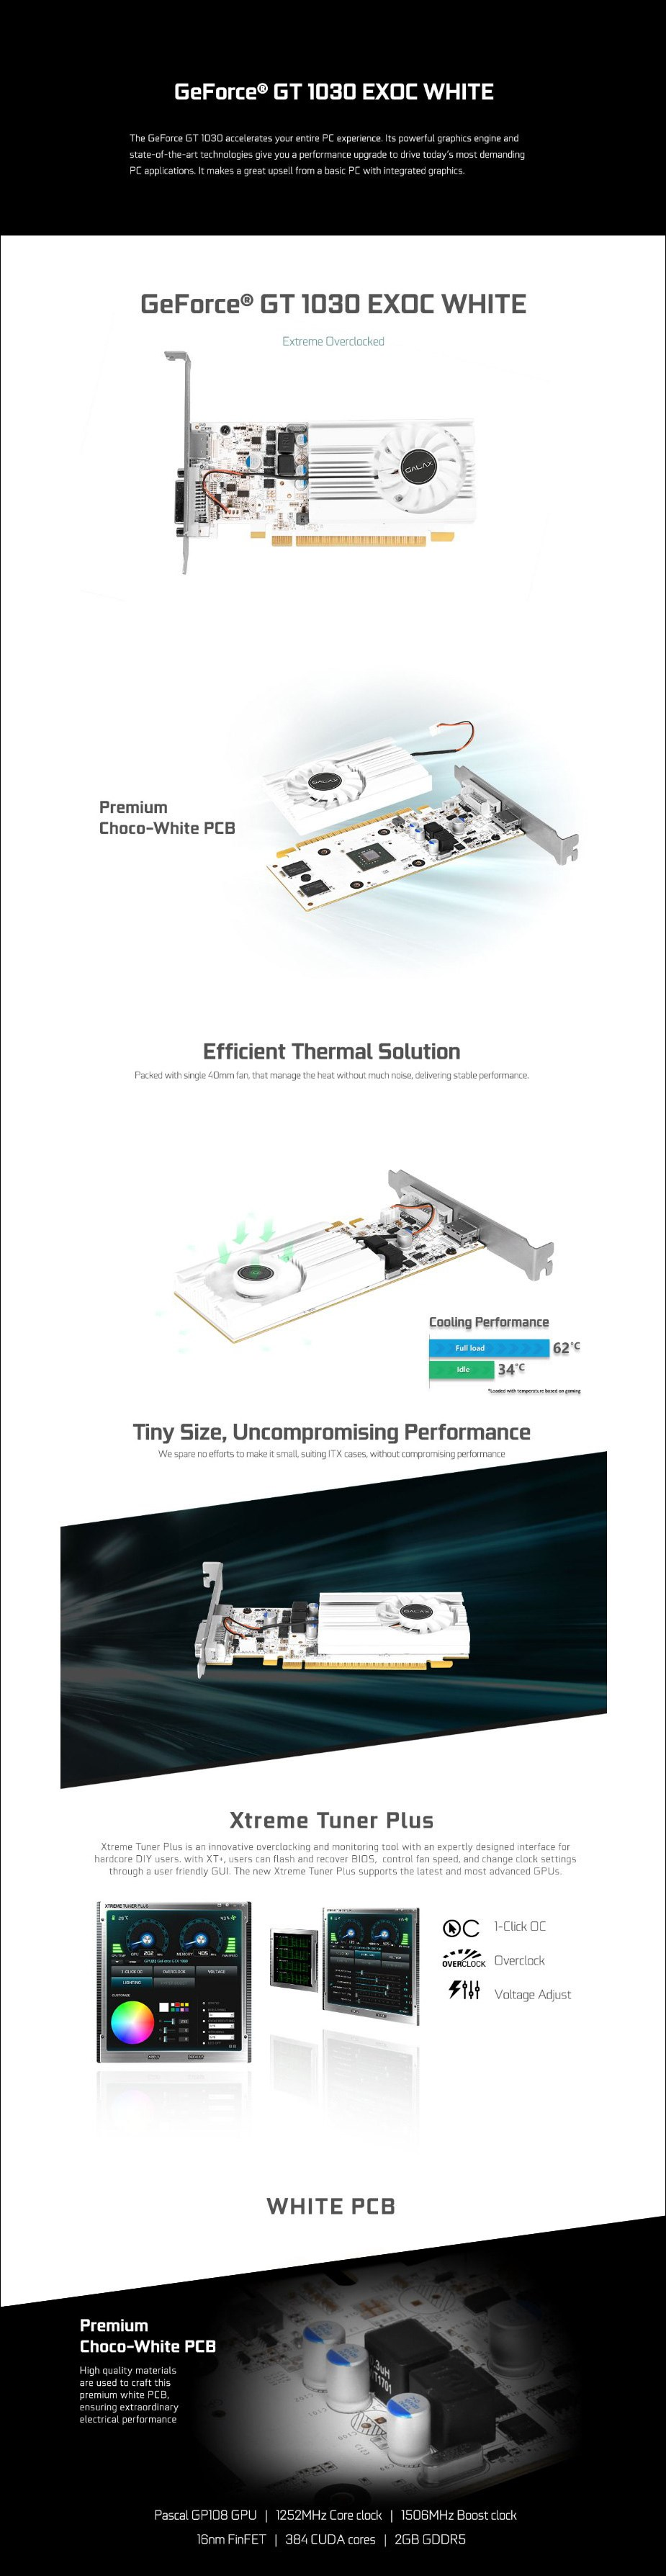 GALAX GeForce GT 1030 EX OC White 2GB Video Card - Overview 1